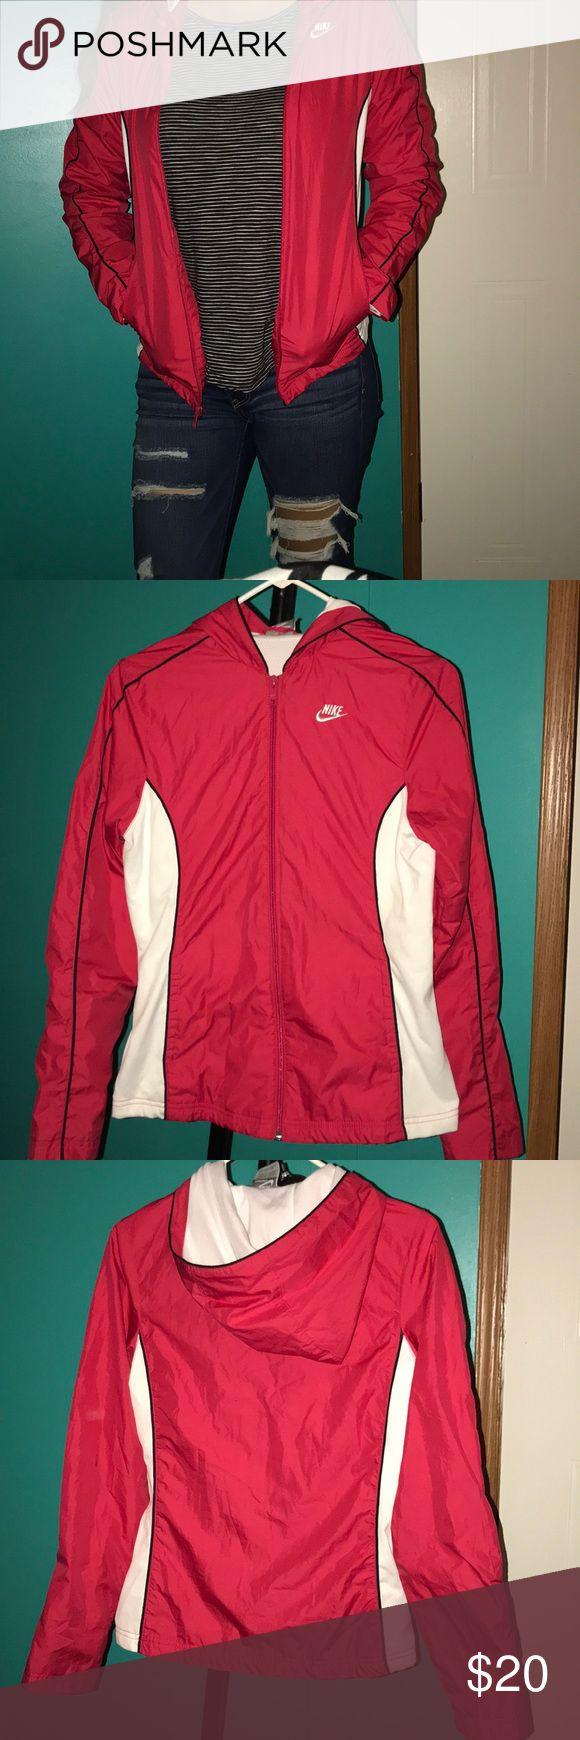 Hot pink Nike sports jacket Good condition Nike Jackets & Coats